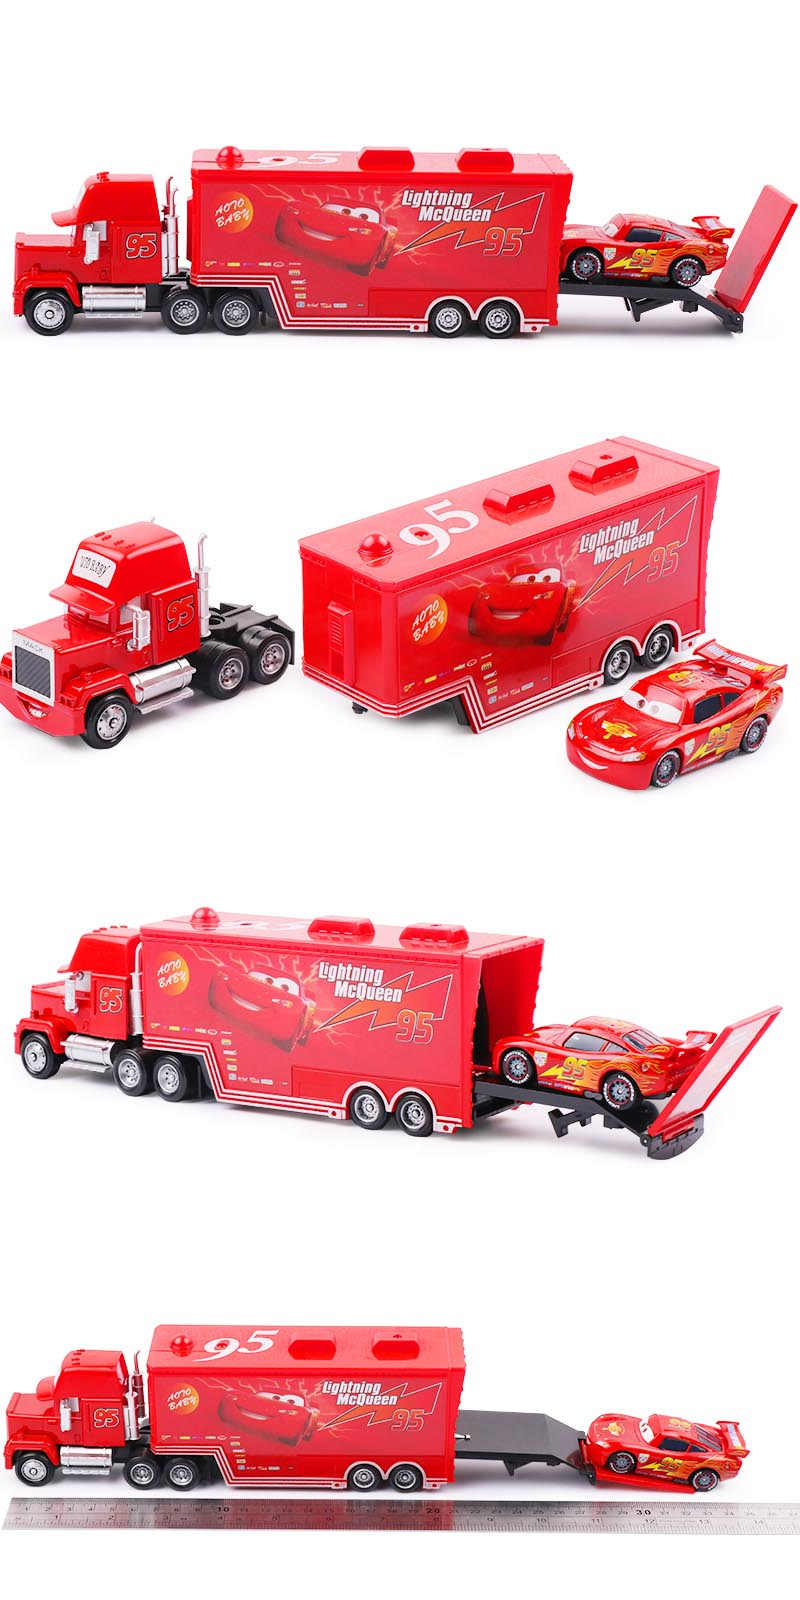 Disney Pixar Cars 2&3 Toys Lightning McQueen 8